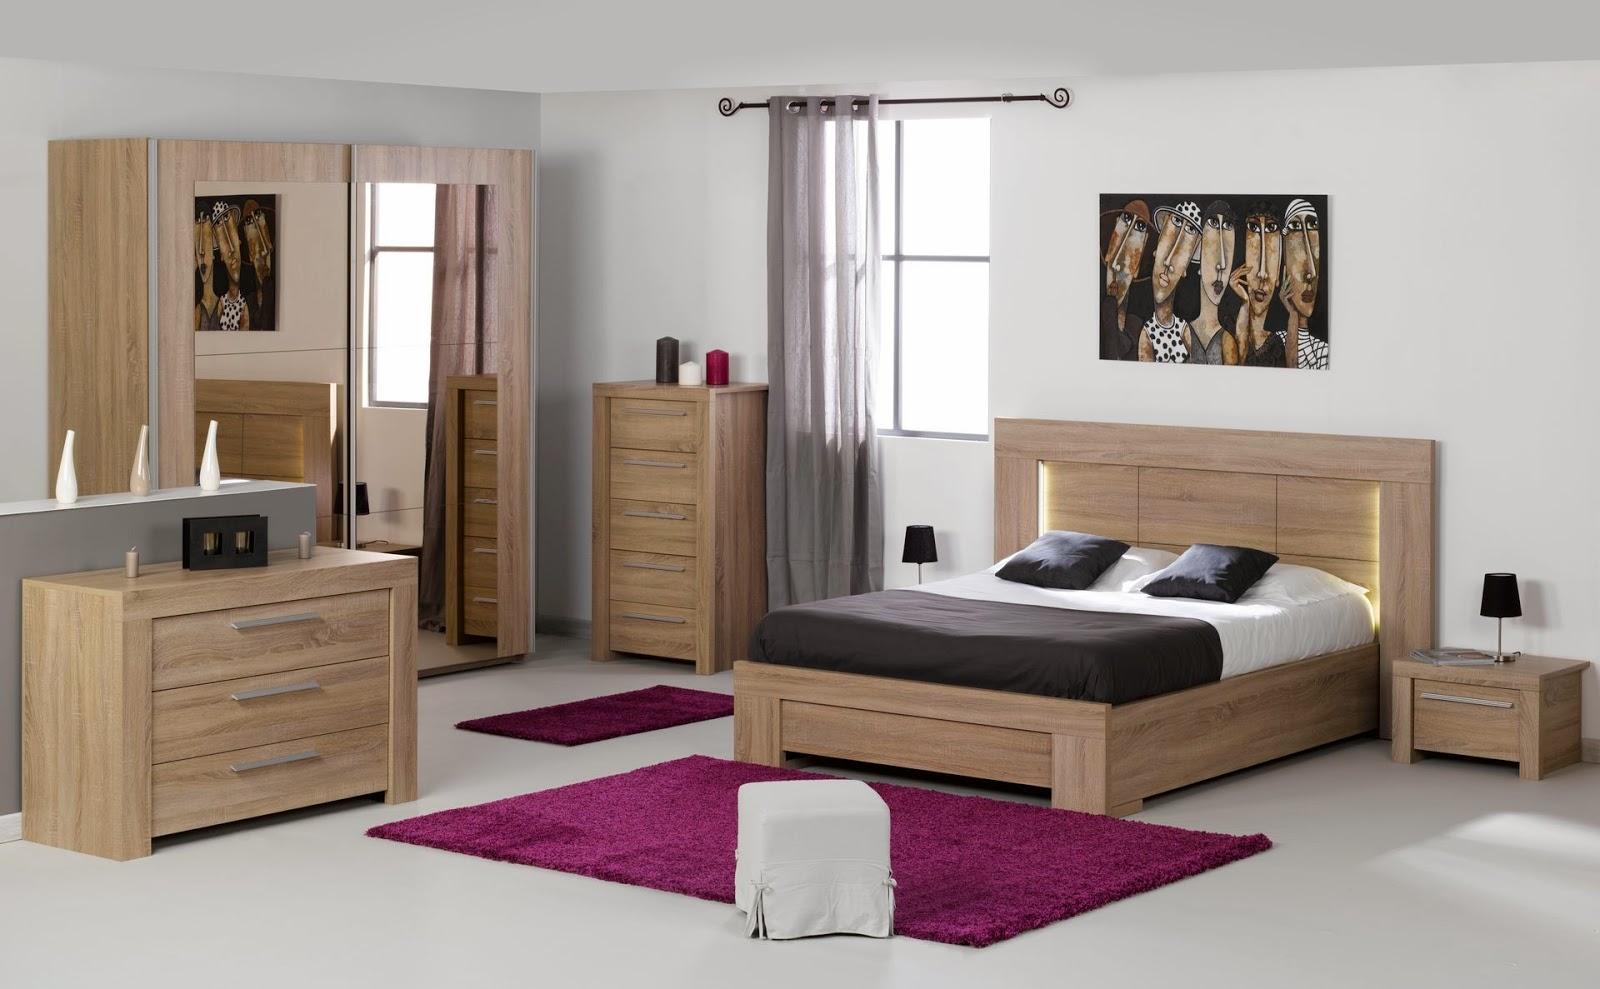 chambre a coucher en bois moderne. Black Bedroom Furniture Sets. Home Design Ideas